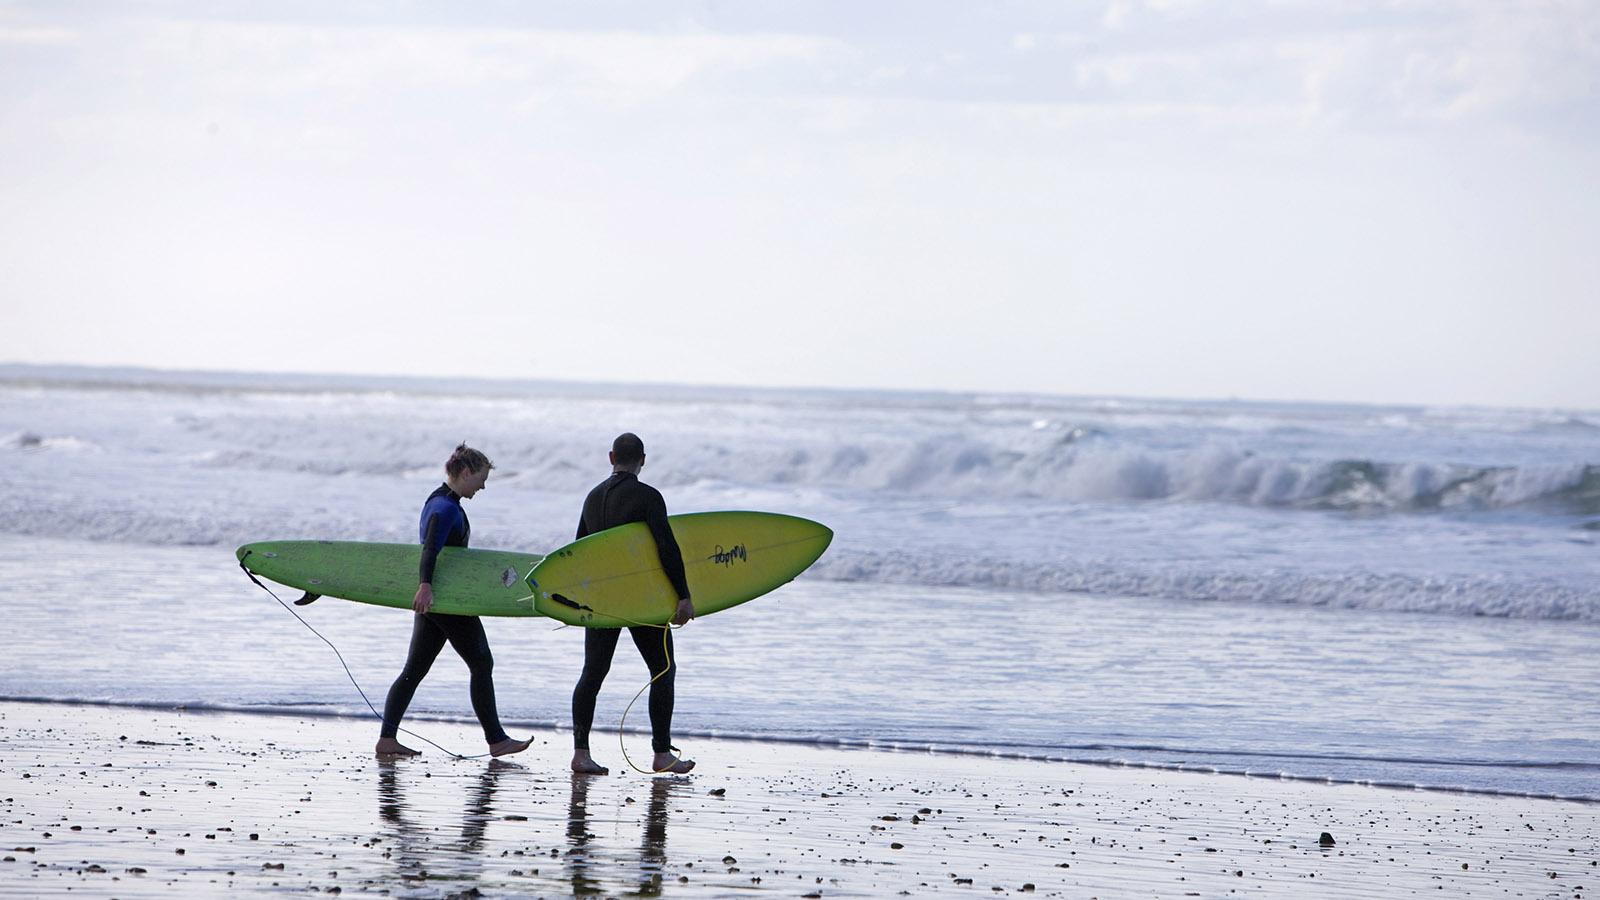 Surfers at Torquay Beach, Great Ocean Road, Victoria, Australia